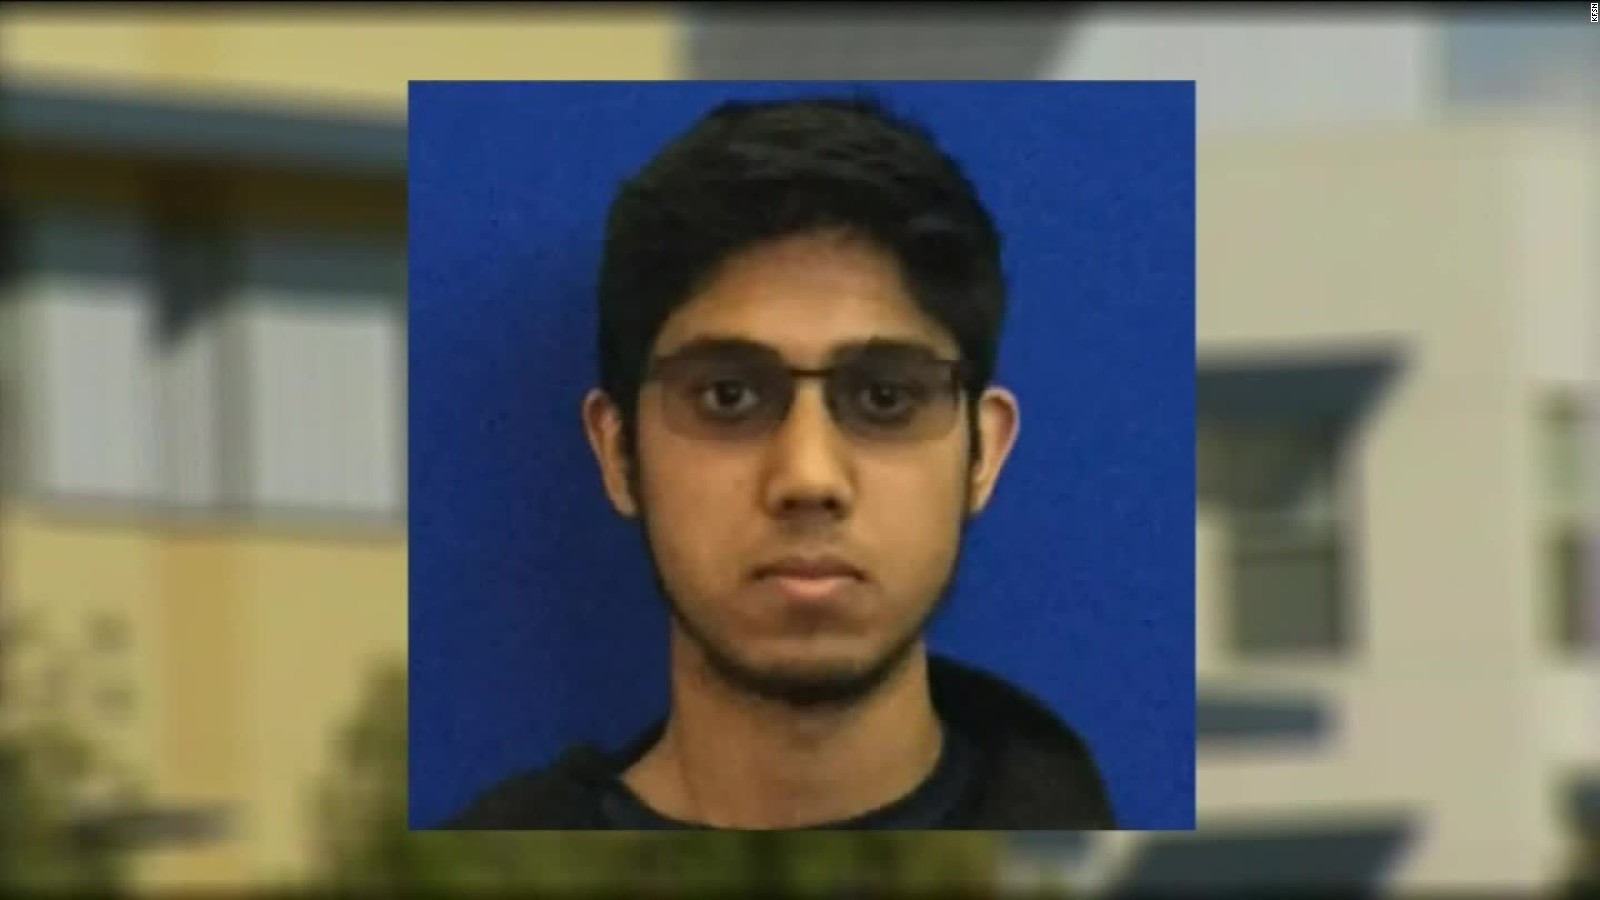 UC Merced stabbings terror-inspired, FBI says - CNN